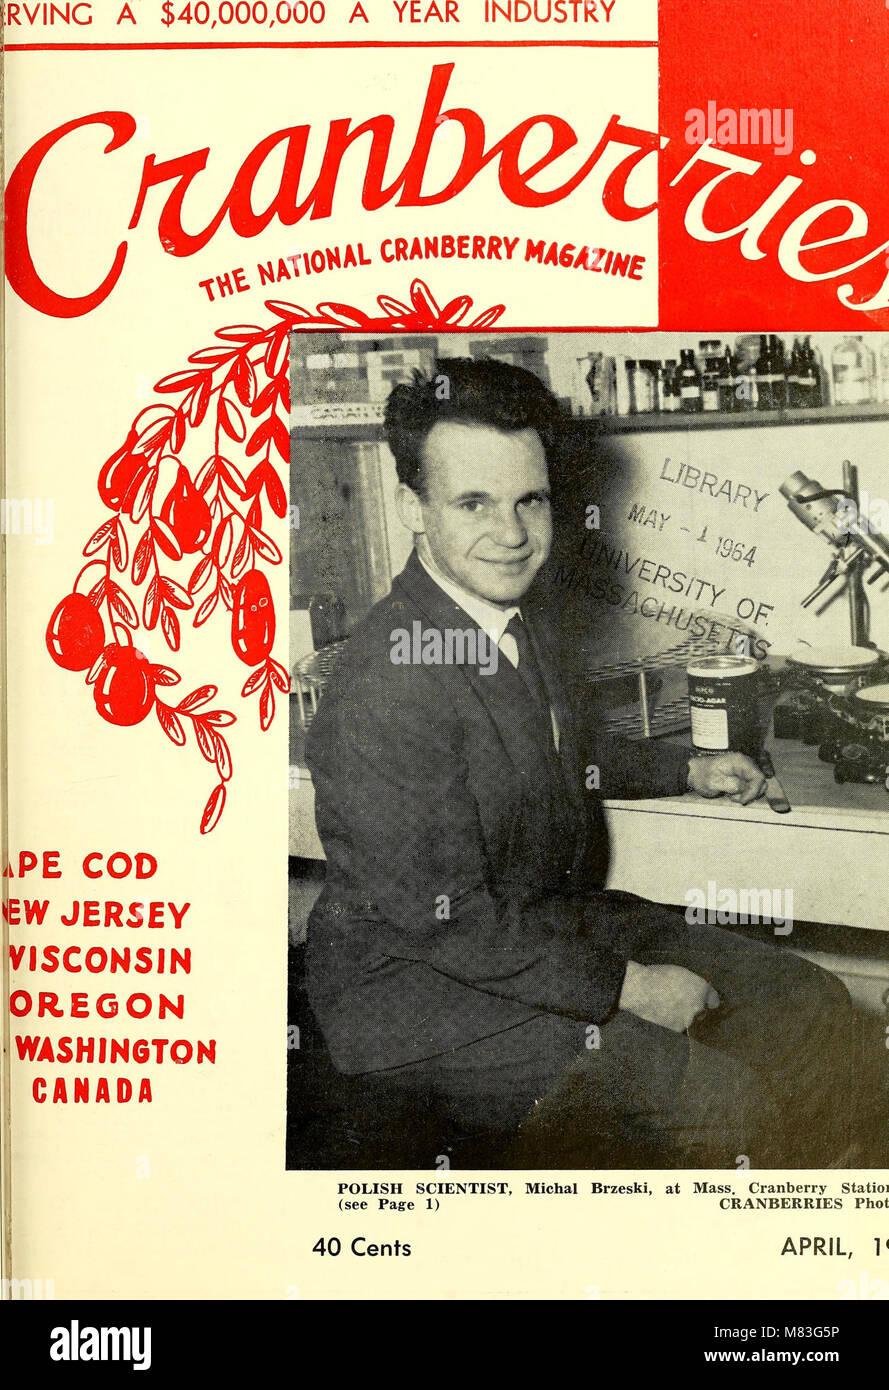 Cranberries; - the national cranberry magazine (1963) (20696388692) Stock Photo